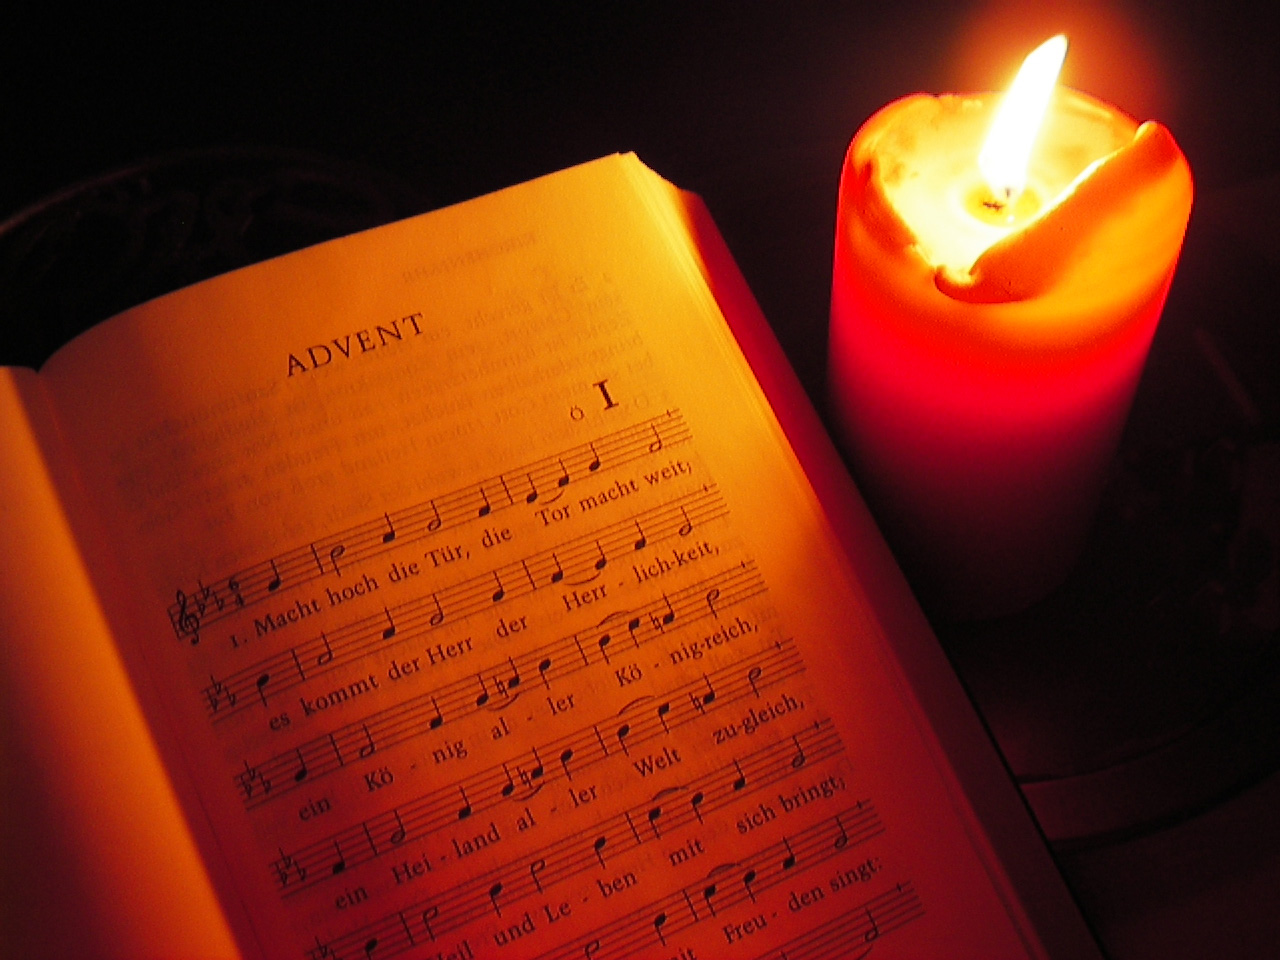 evening prayer 4 dec 11 second sunday of advent daily. Black Bedroom Furniture Sets. Home Design Ideas